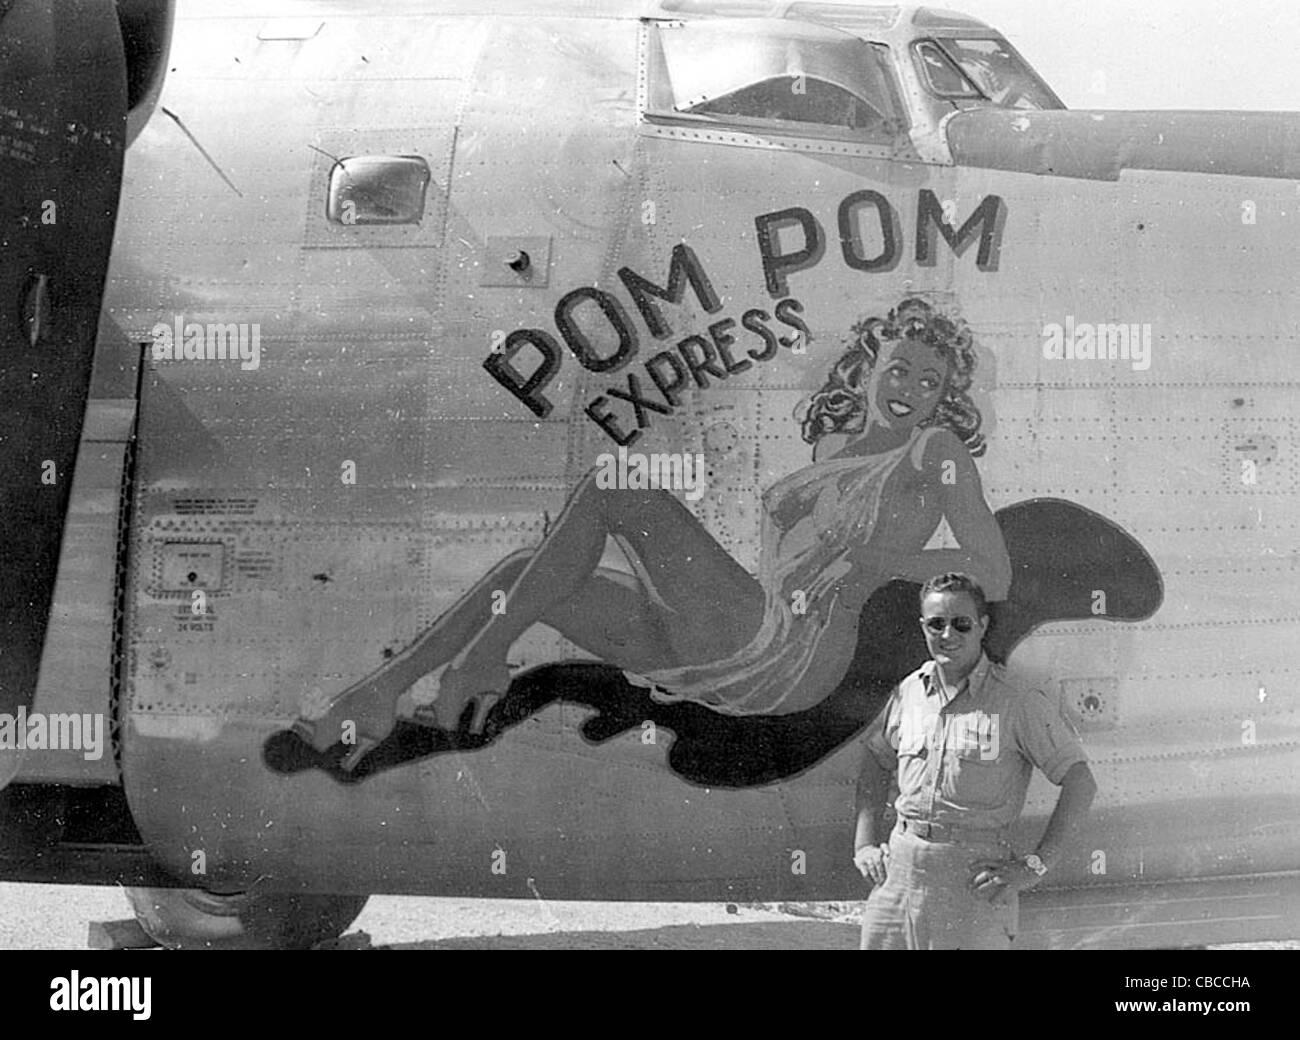 Girl Tshirts Hd Wallpaper Ww11 Usaaf Liberator Nose Art Pom Pom Express Stock Photo